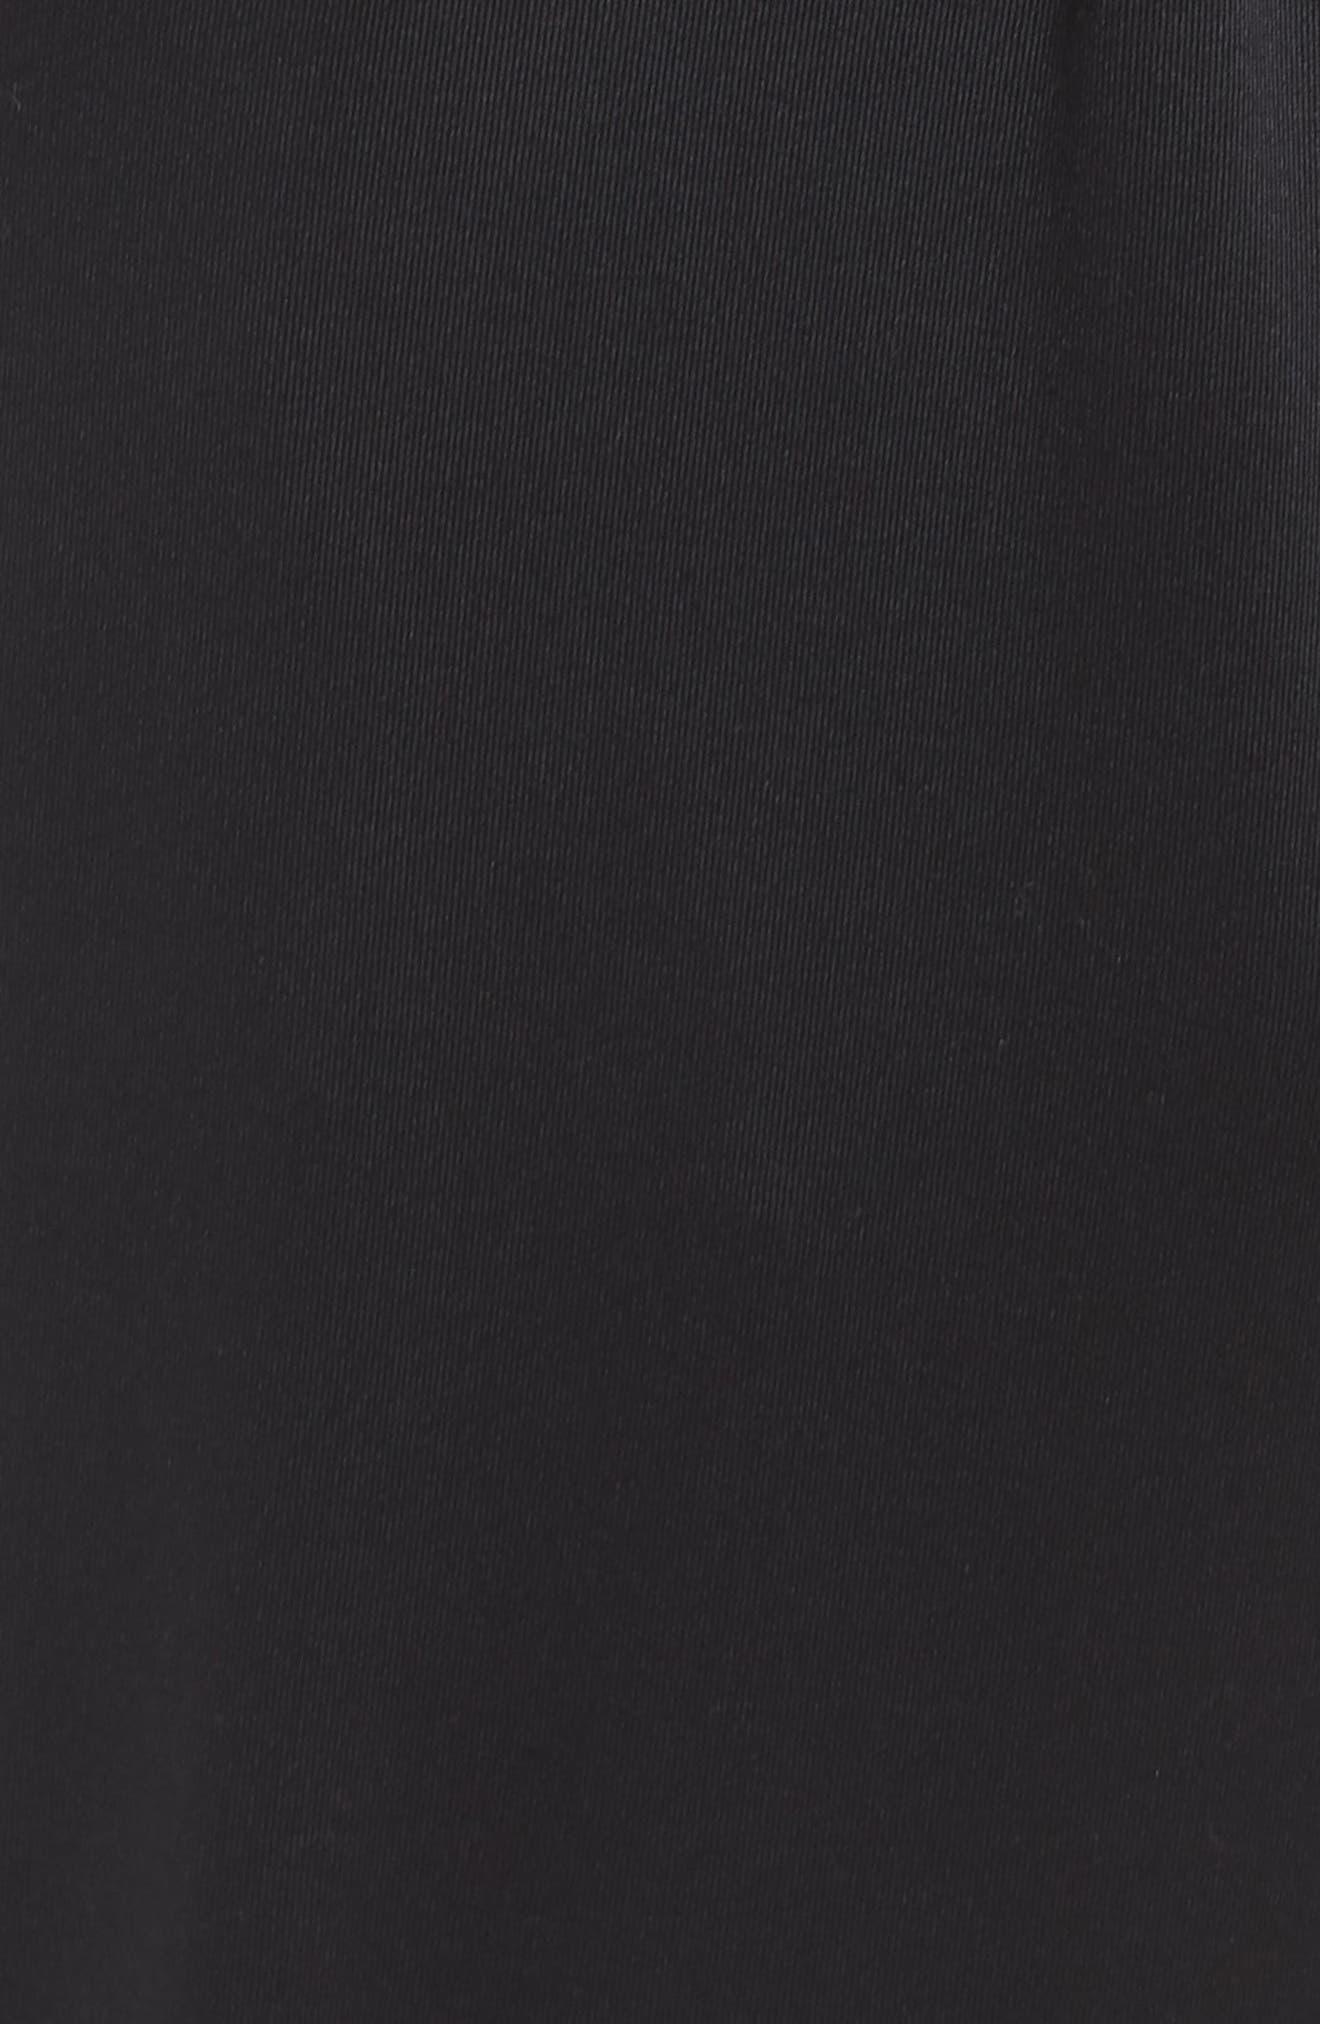 Dry Lux Flow Training Pants,                             Alternate thumbnail 5, color,                             Black/ Clear